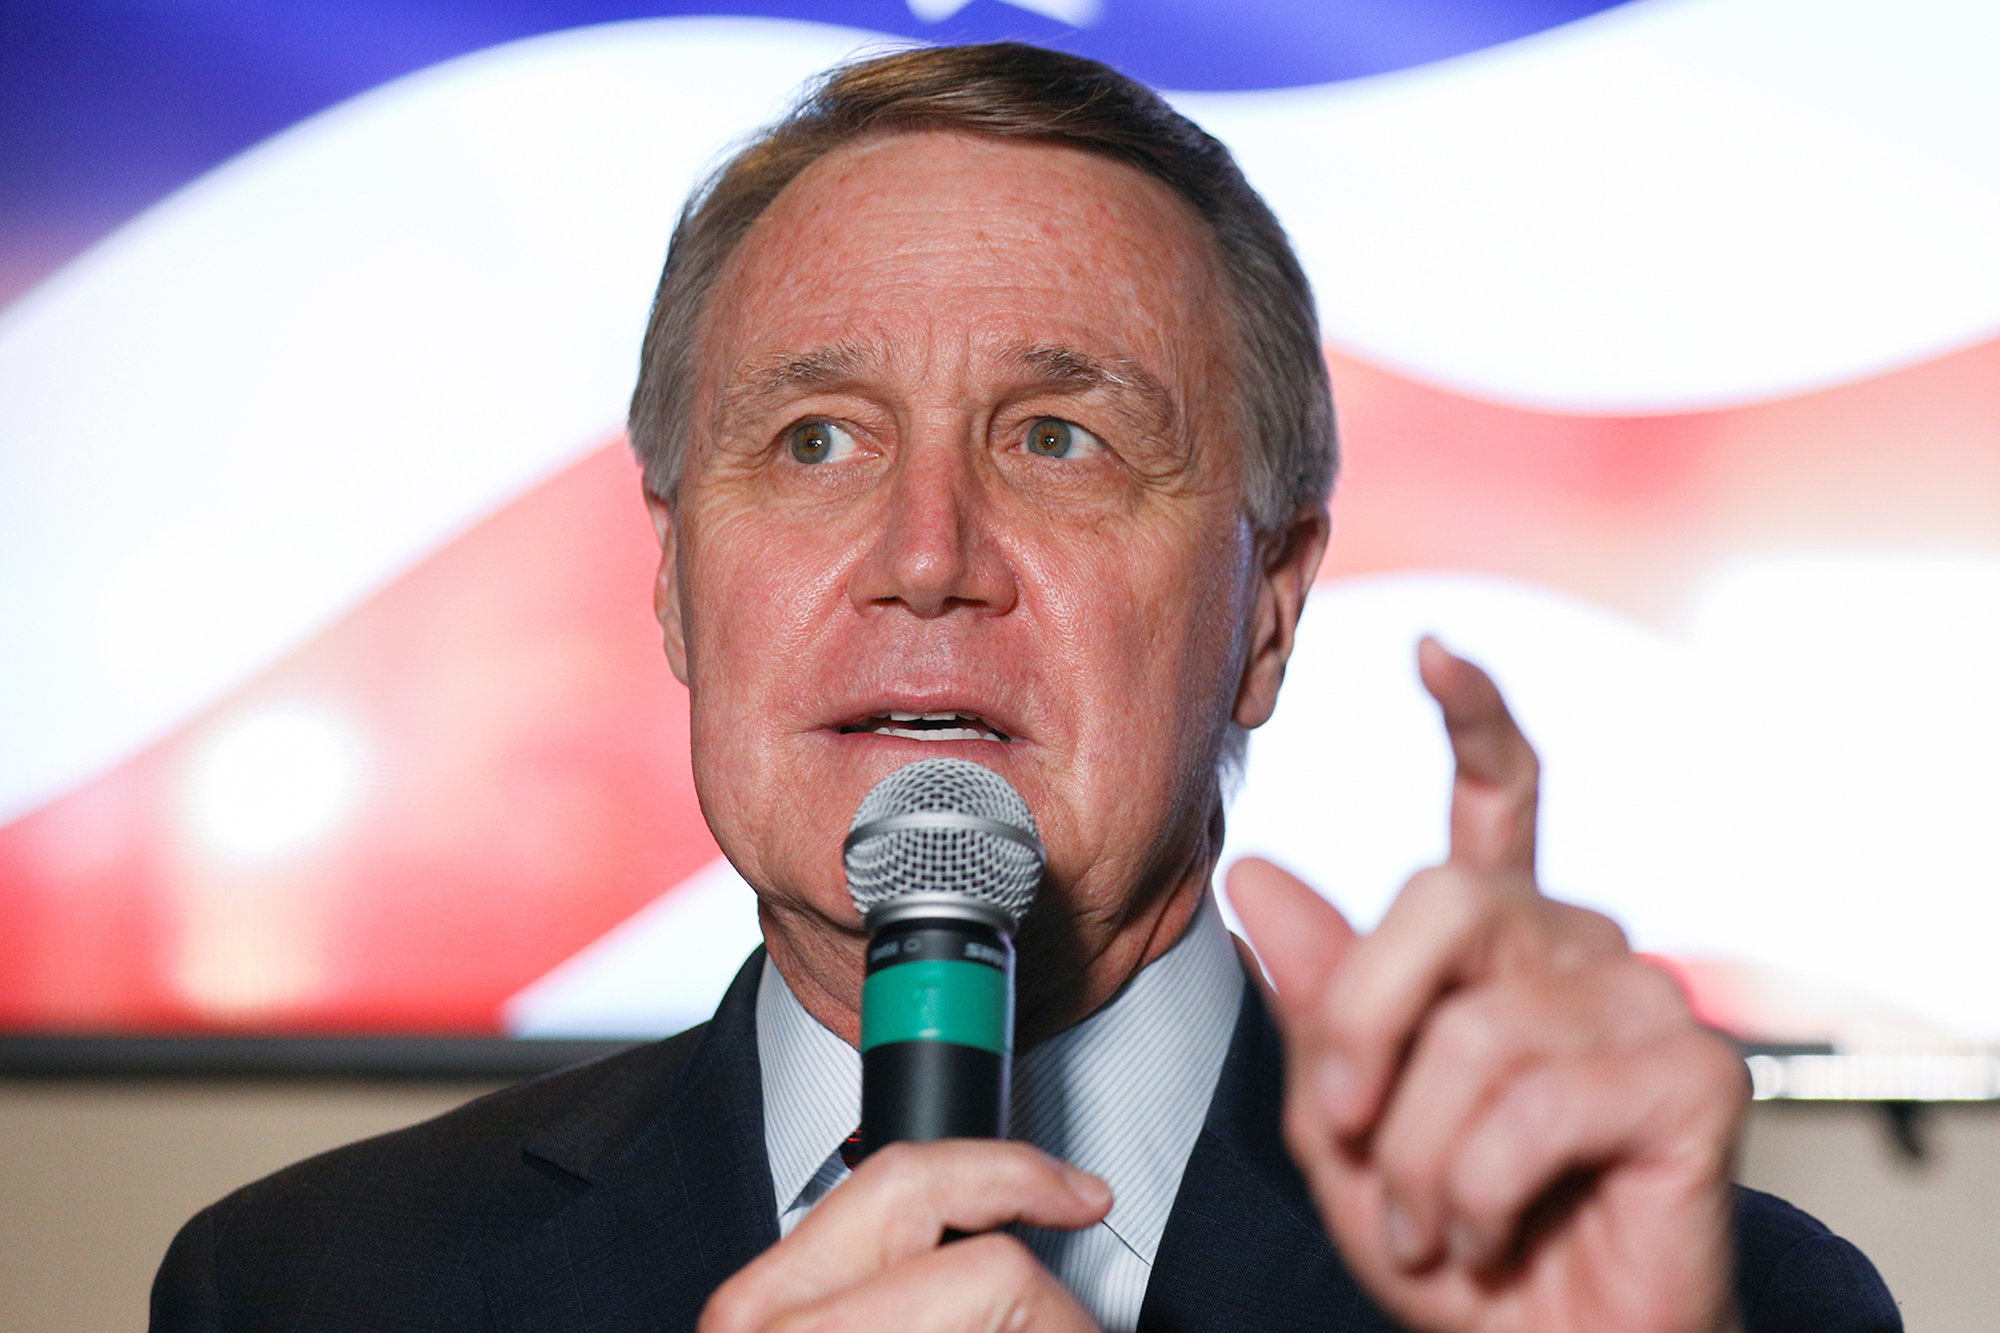 David Purdue backs GOP effort to object to Electoral College certification